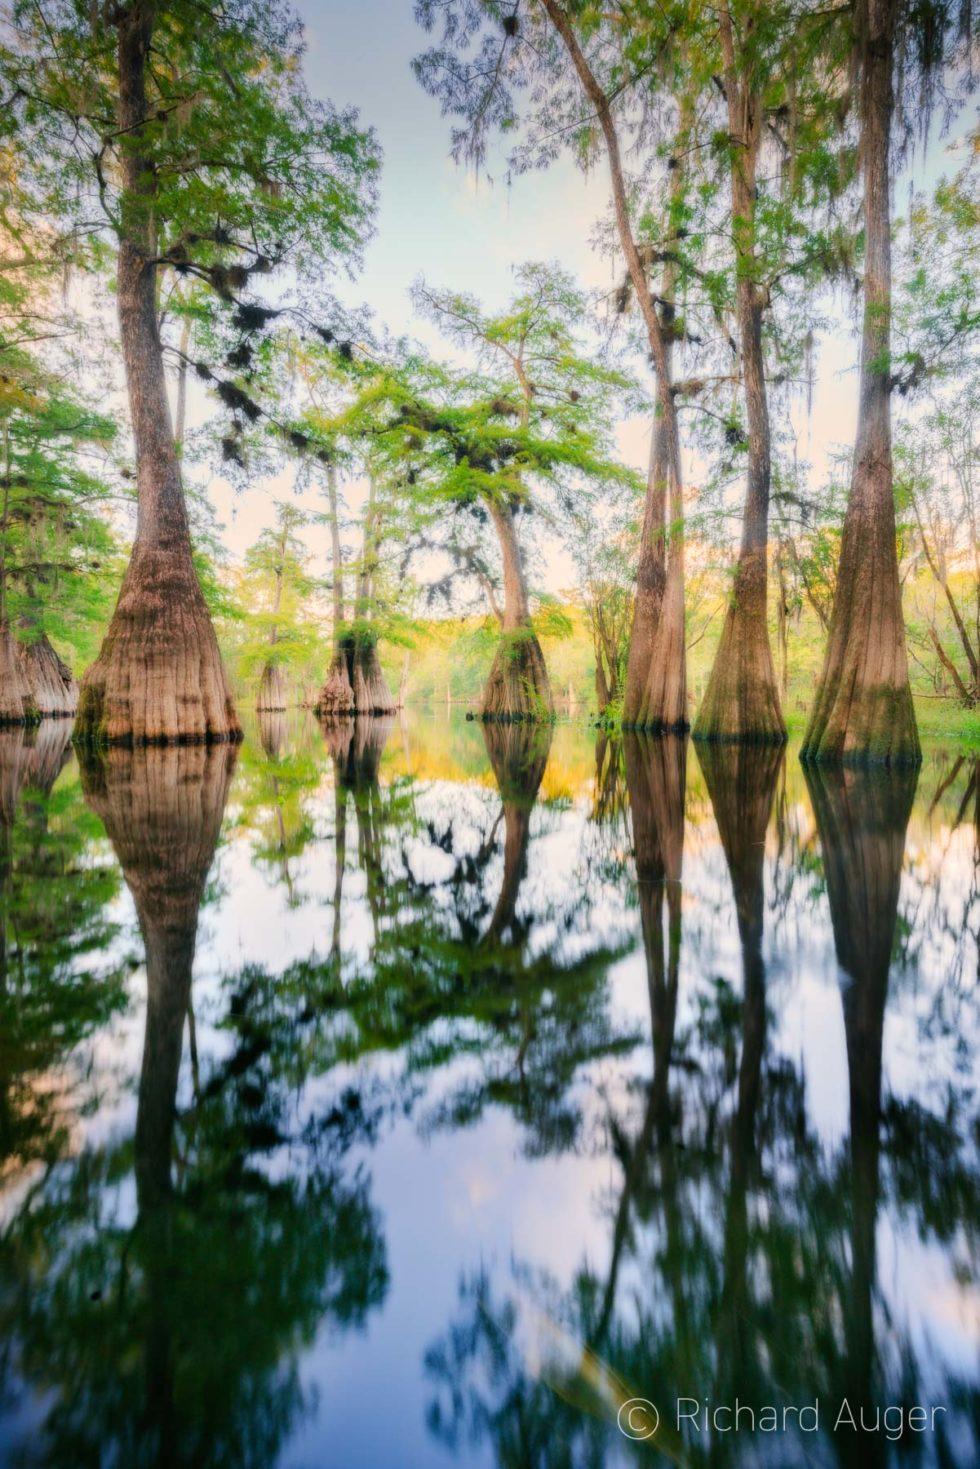 Santa Fe River, Suwannee River, Cypress, Florida, Evening, water, photographer, richard auger, nature, landscape